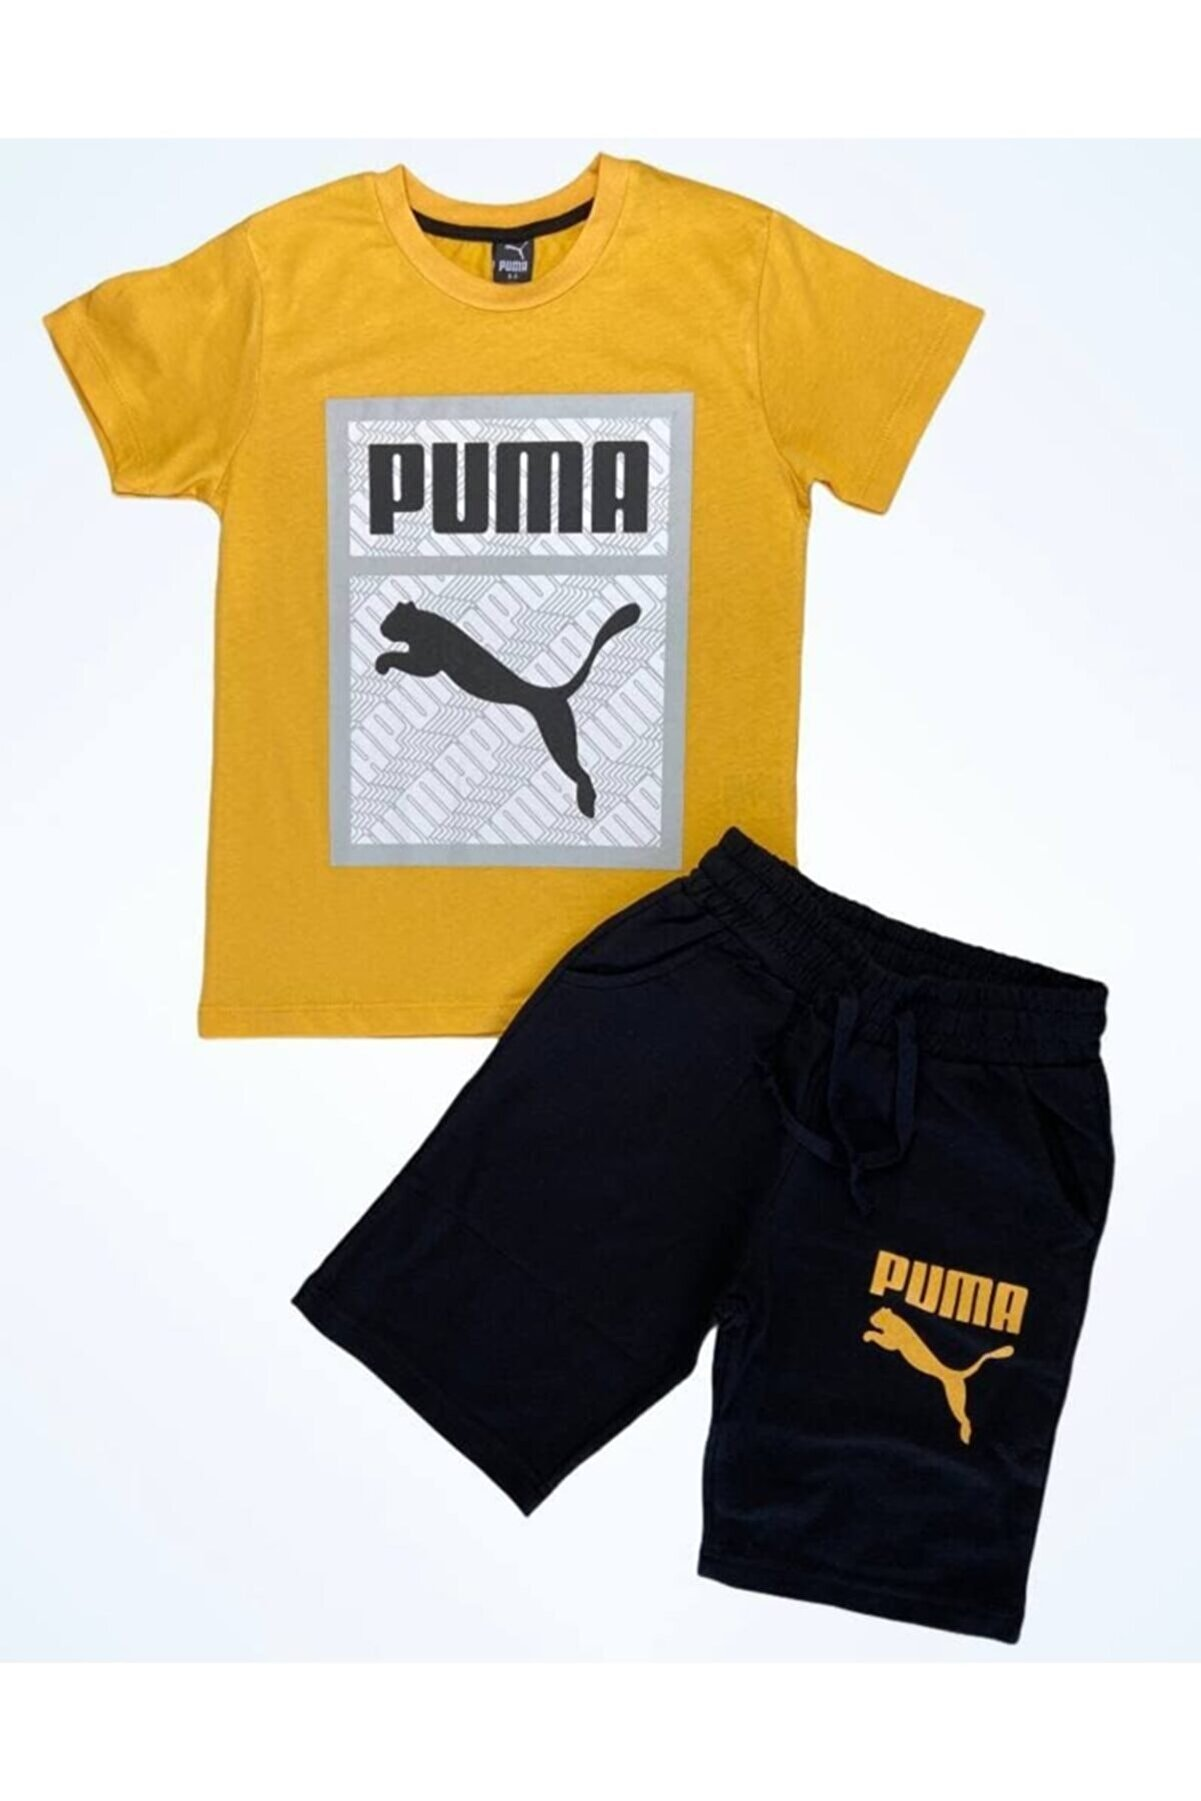 Puma Erkek Çocuk Şortlu Penye Takım